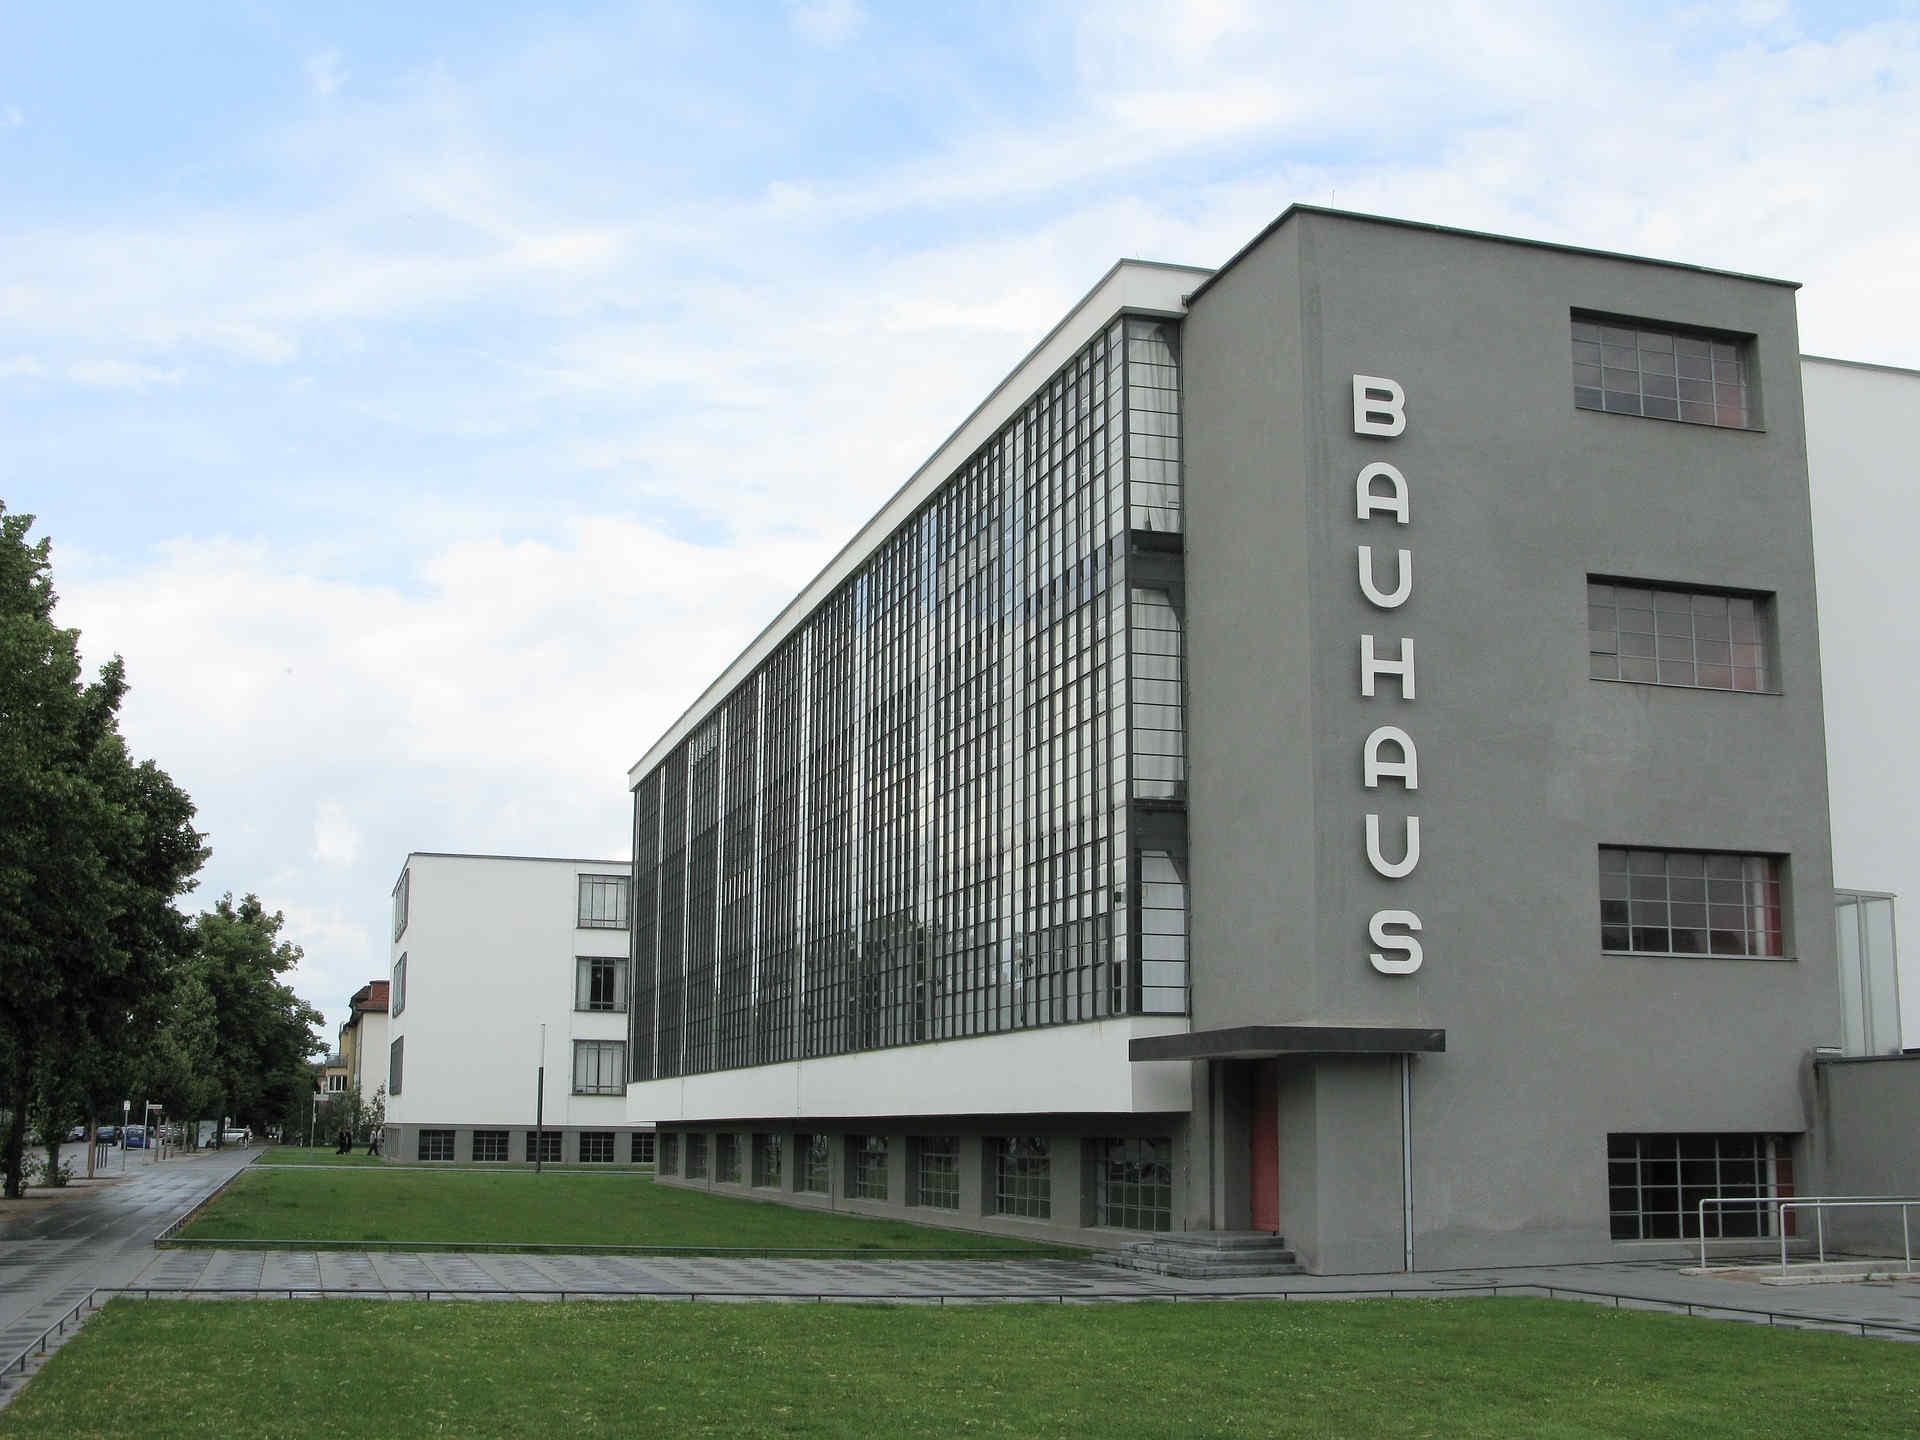 T.J Personalleasing - Standort Dessau-Rosslau